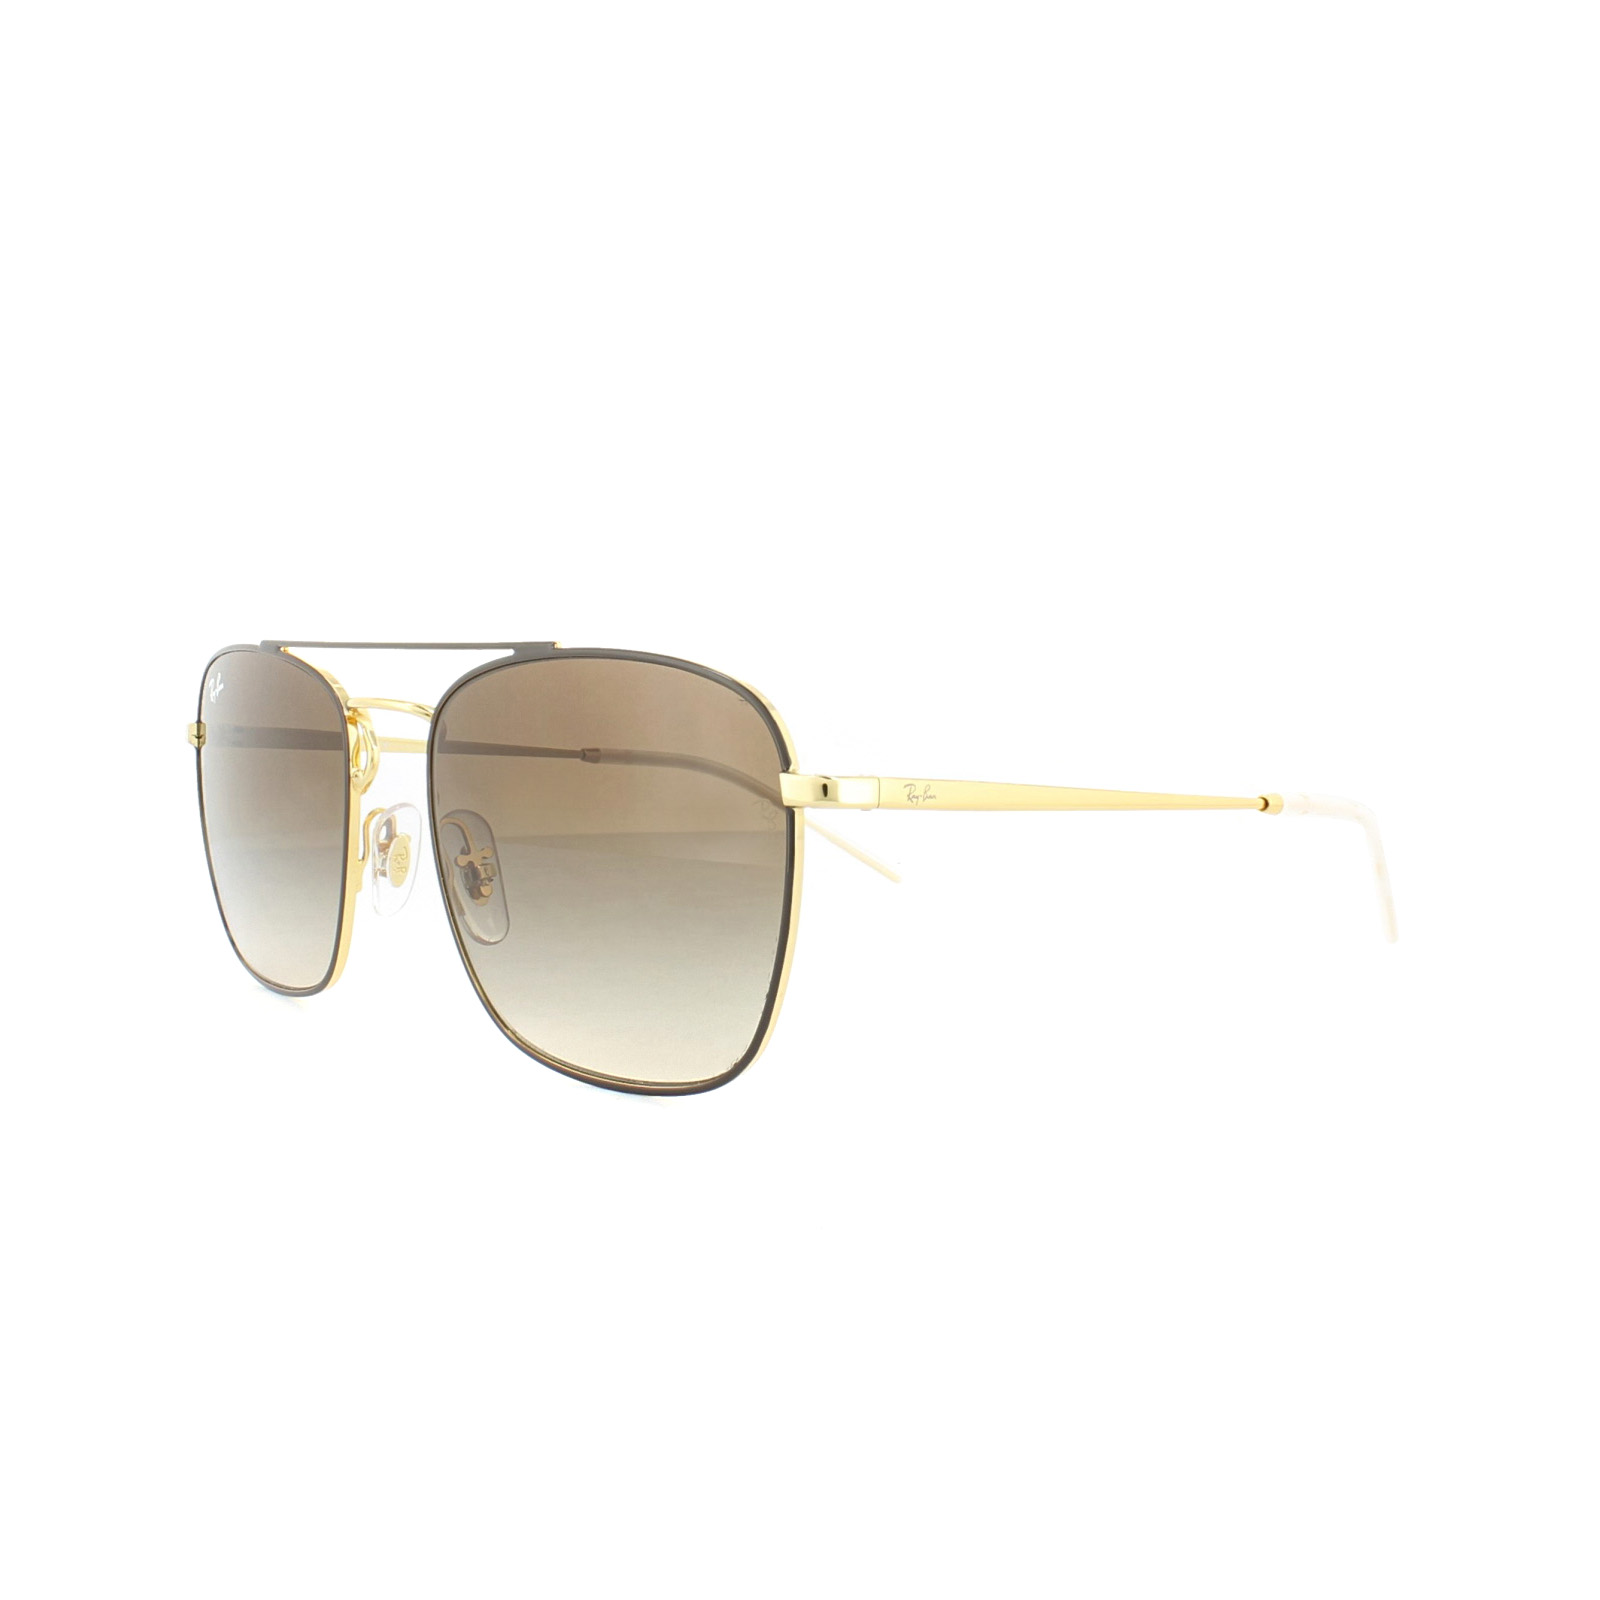 b06d73eae16 Sentinel Ray-Ban Sunglasses 3588 905513 Brown Gold Brown Gradient